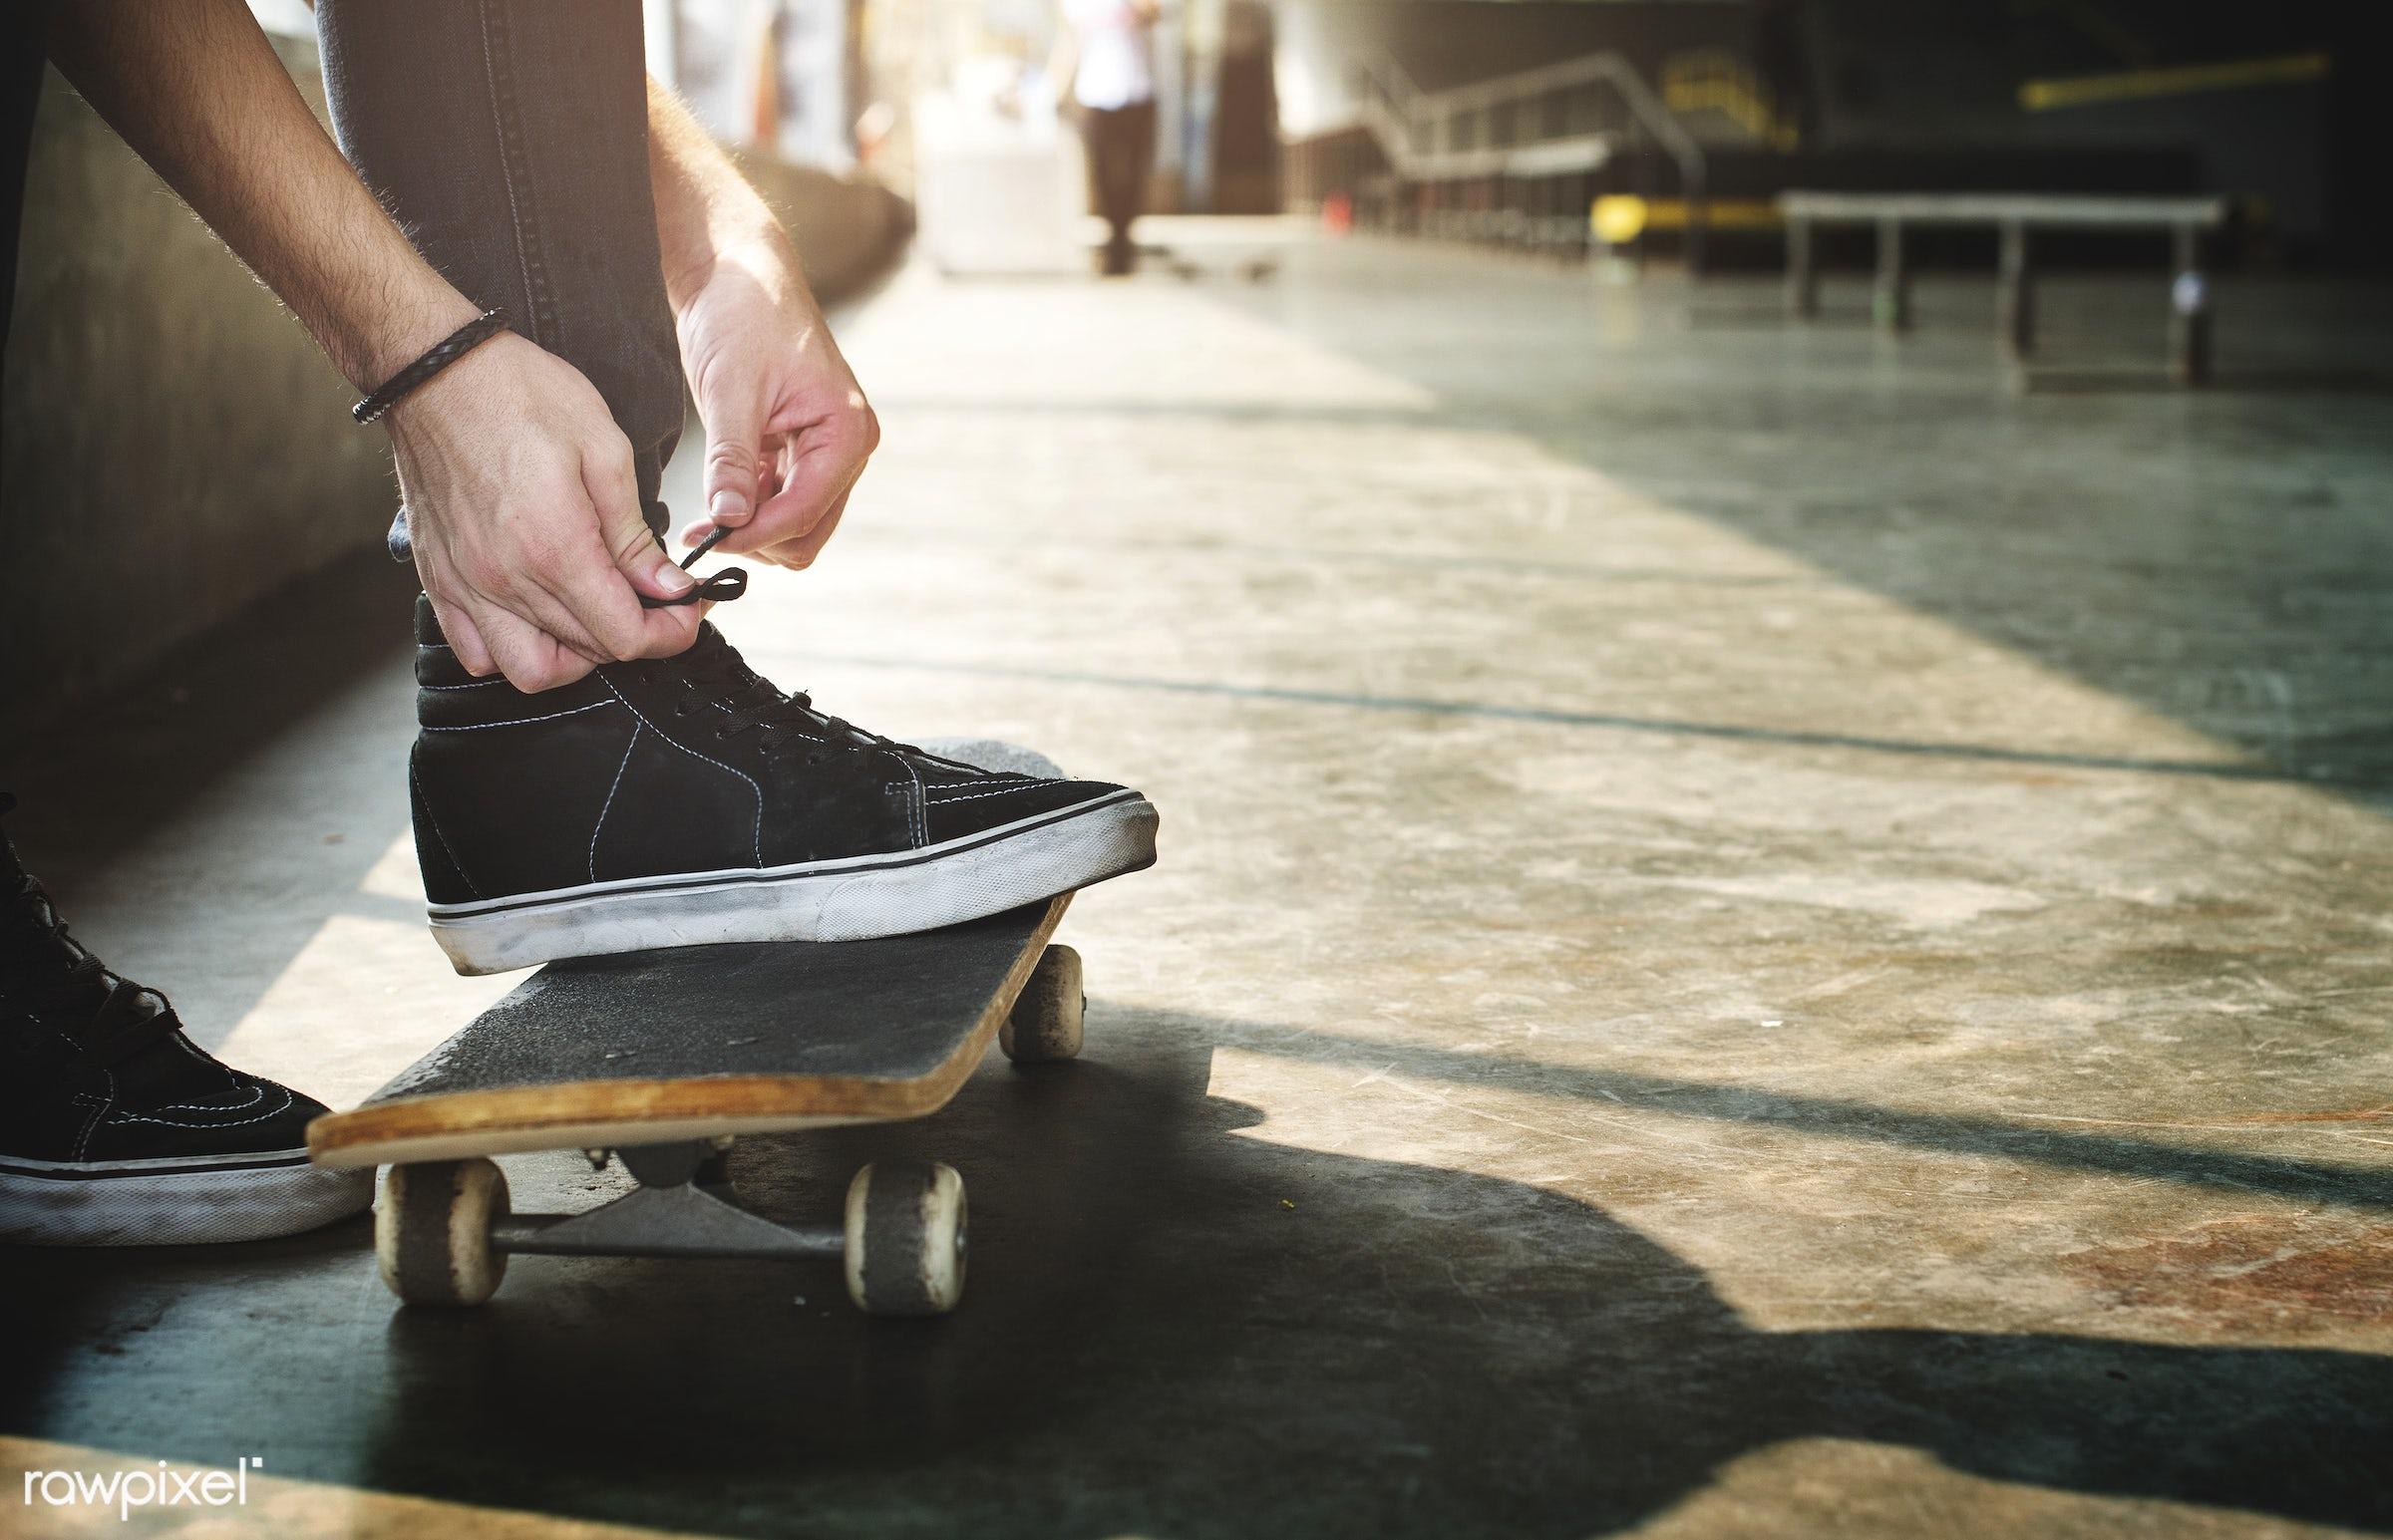 shoes, extreme sport, tying, hobby, feet, leisure, skateboard, robe, skatepark, hands, sneakers, alone, closeup